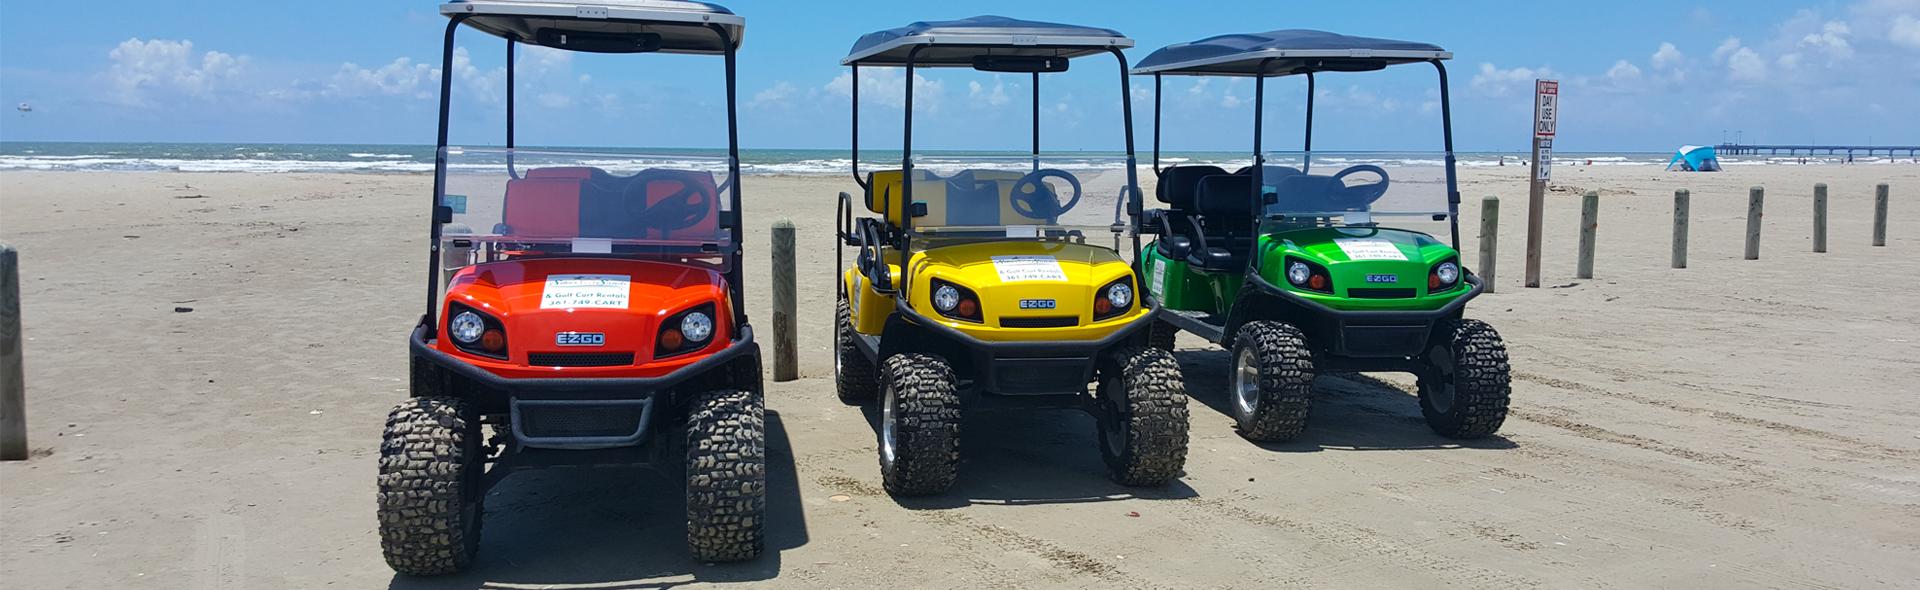 Three Silver Sands Golf Cart Rentals rental golf carts on the Port Aransas beach.